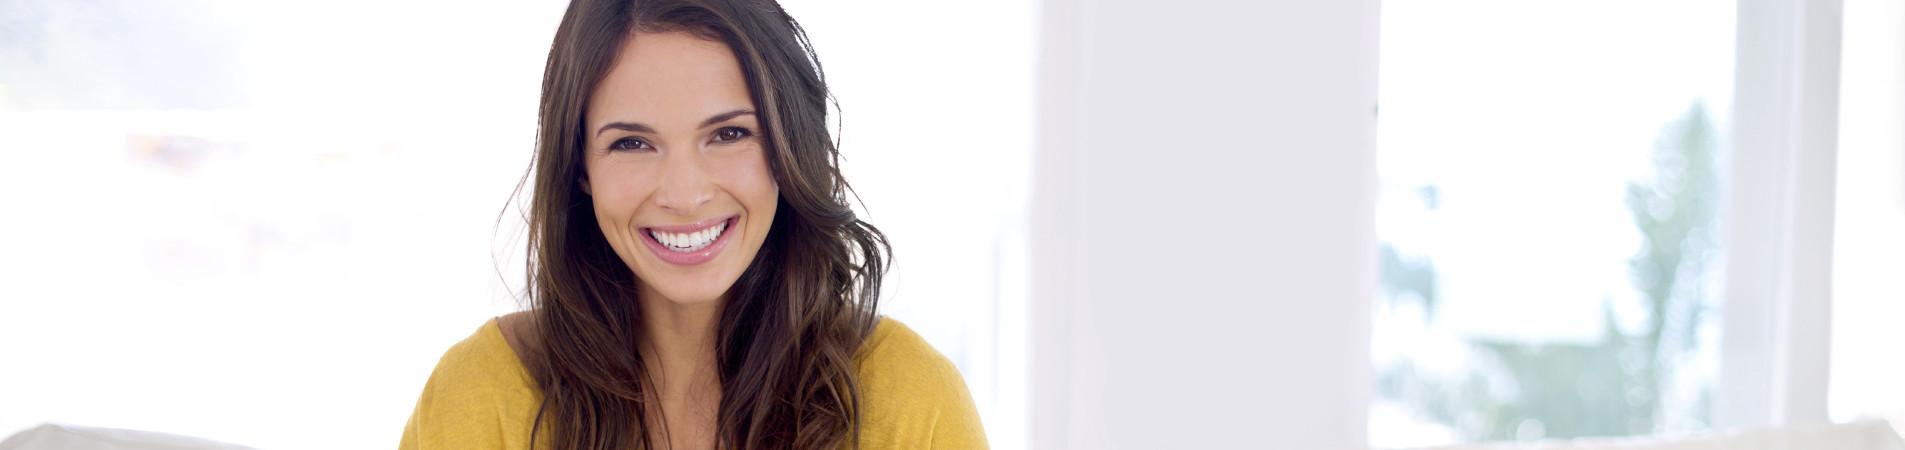 Frau lächelt - schöne Zähne